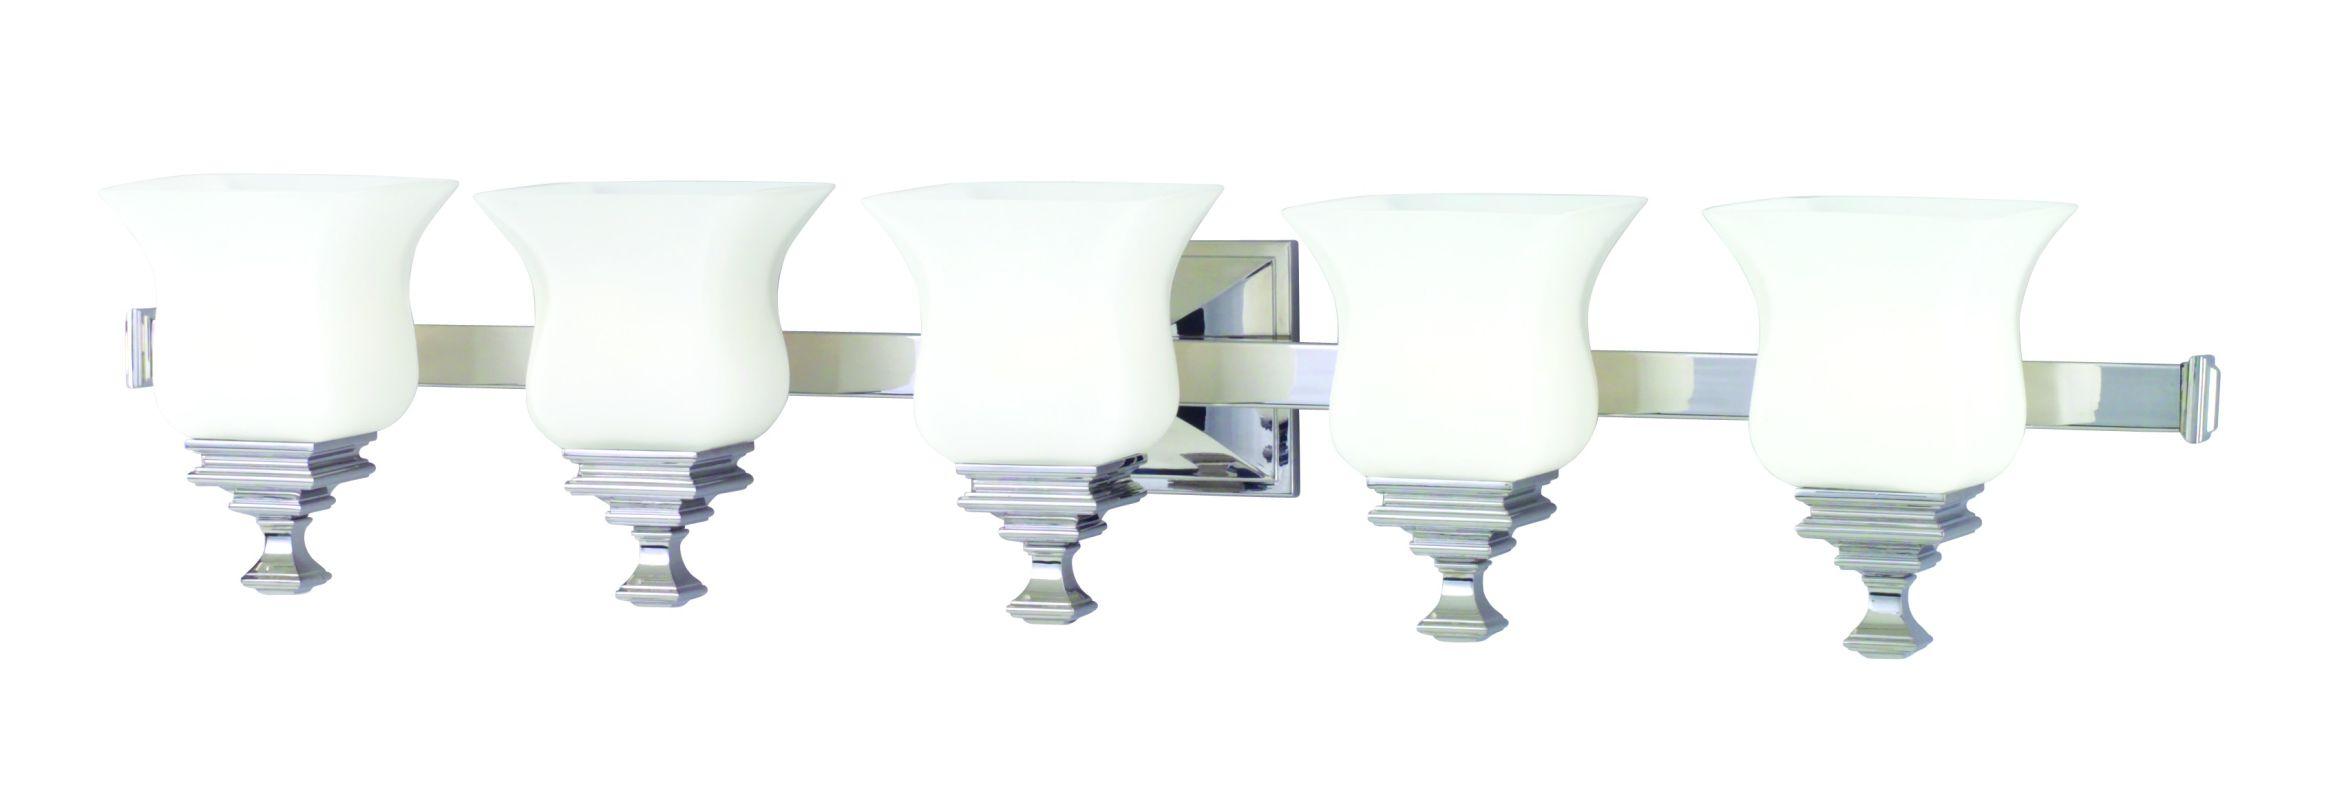 Hudson Valley Lighting 5505 Wilton 5 Light Bathroom Vanity Fixture Sale $578.00 ITEM: bci524000 ID#:5505-SN UPC: 806134019600 :